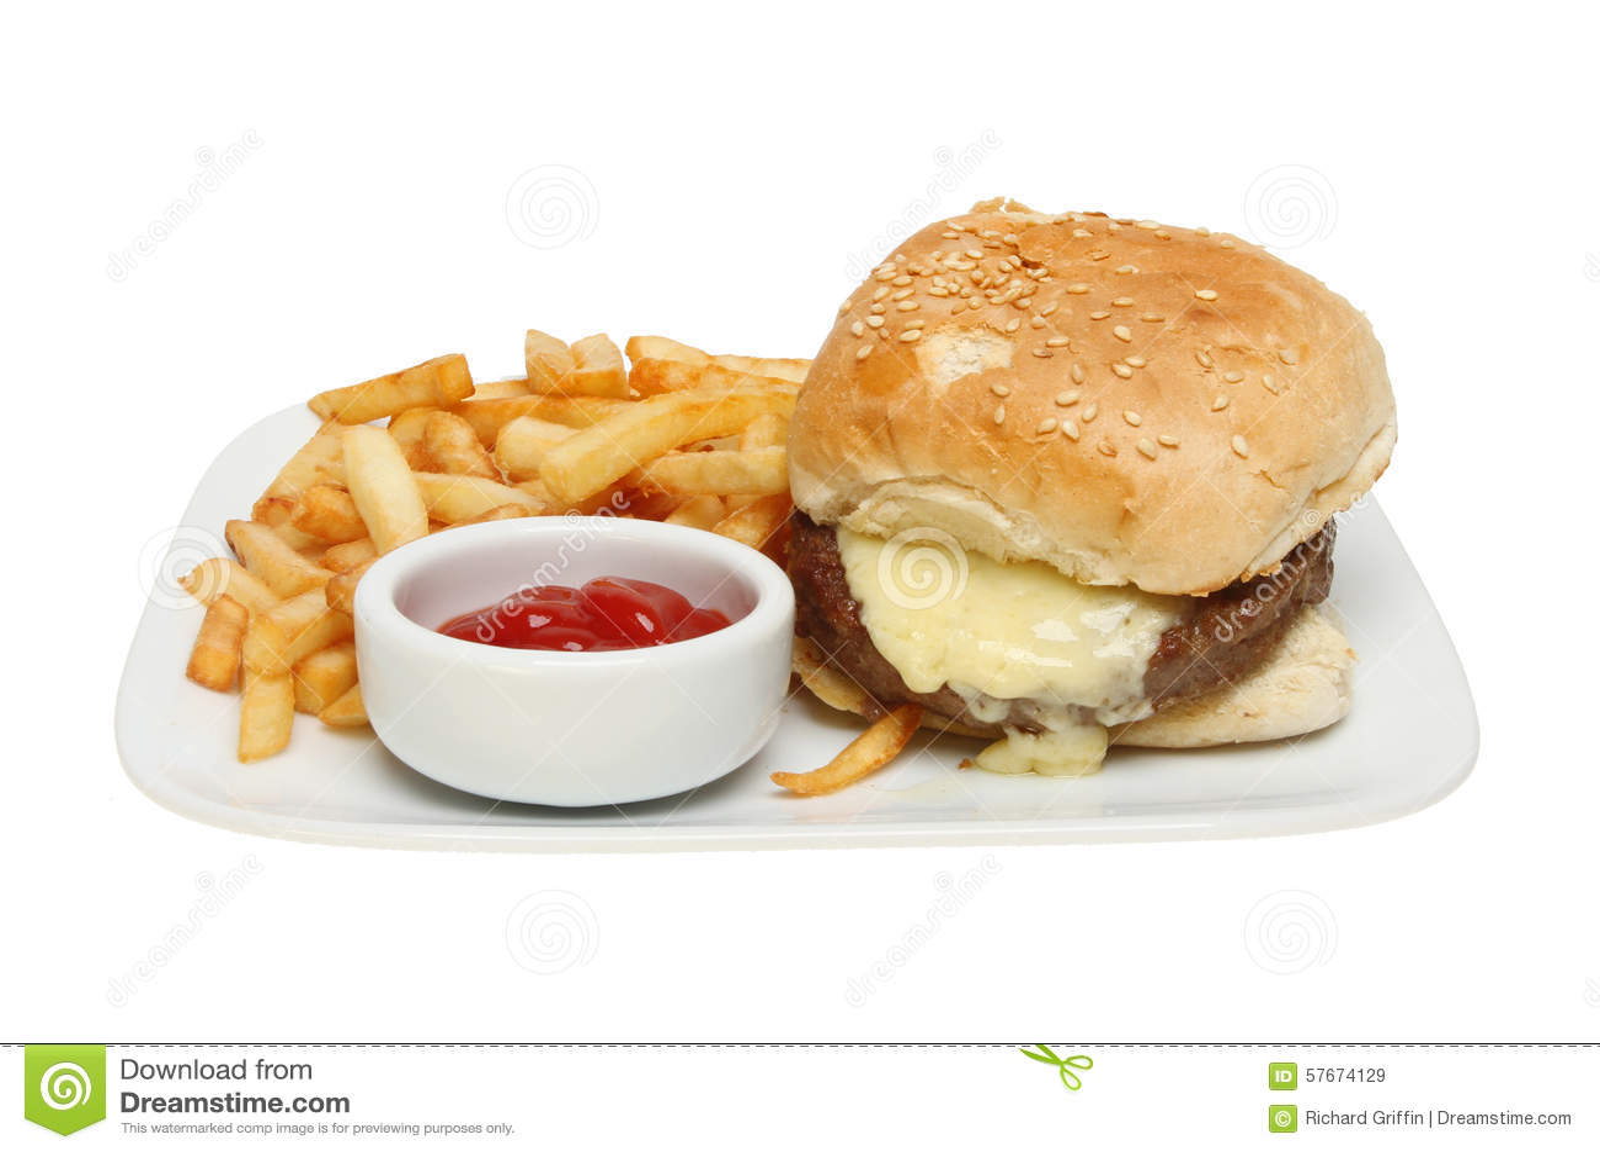 Cheeseburger i układ scalony